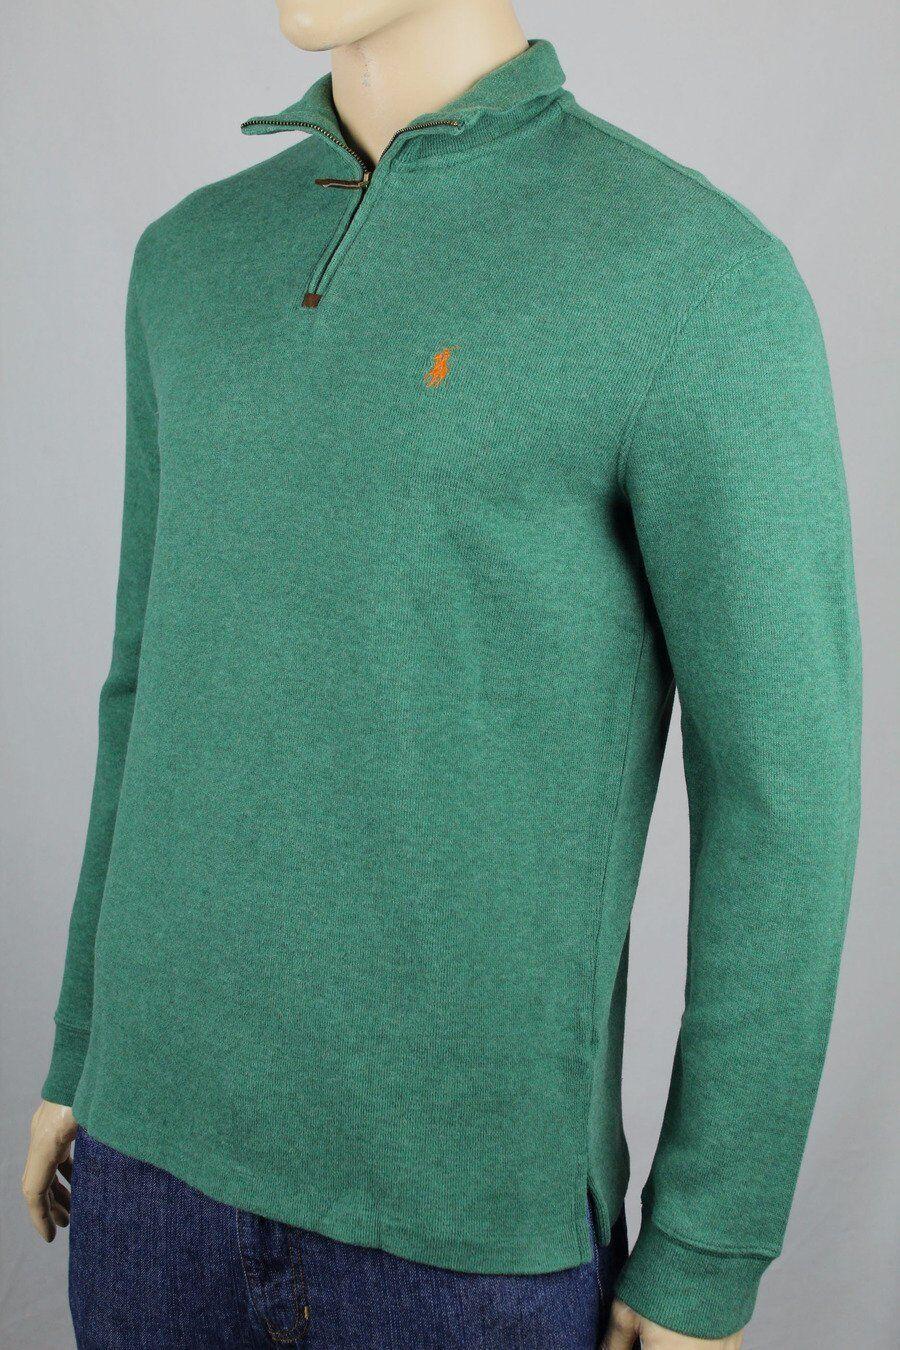 Polo Ralph Lauren Green 1 2 Half Zip Sweater orange Pony NWT